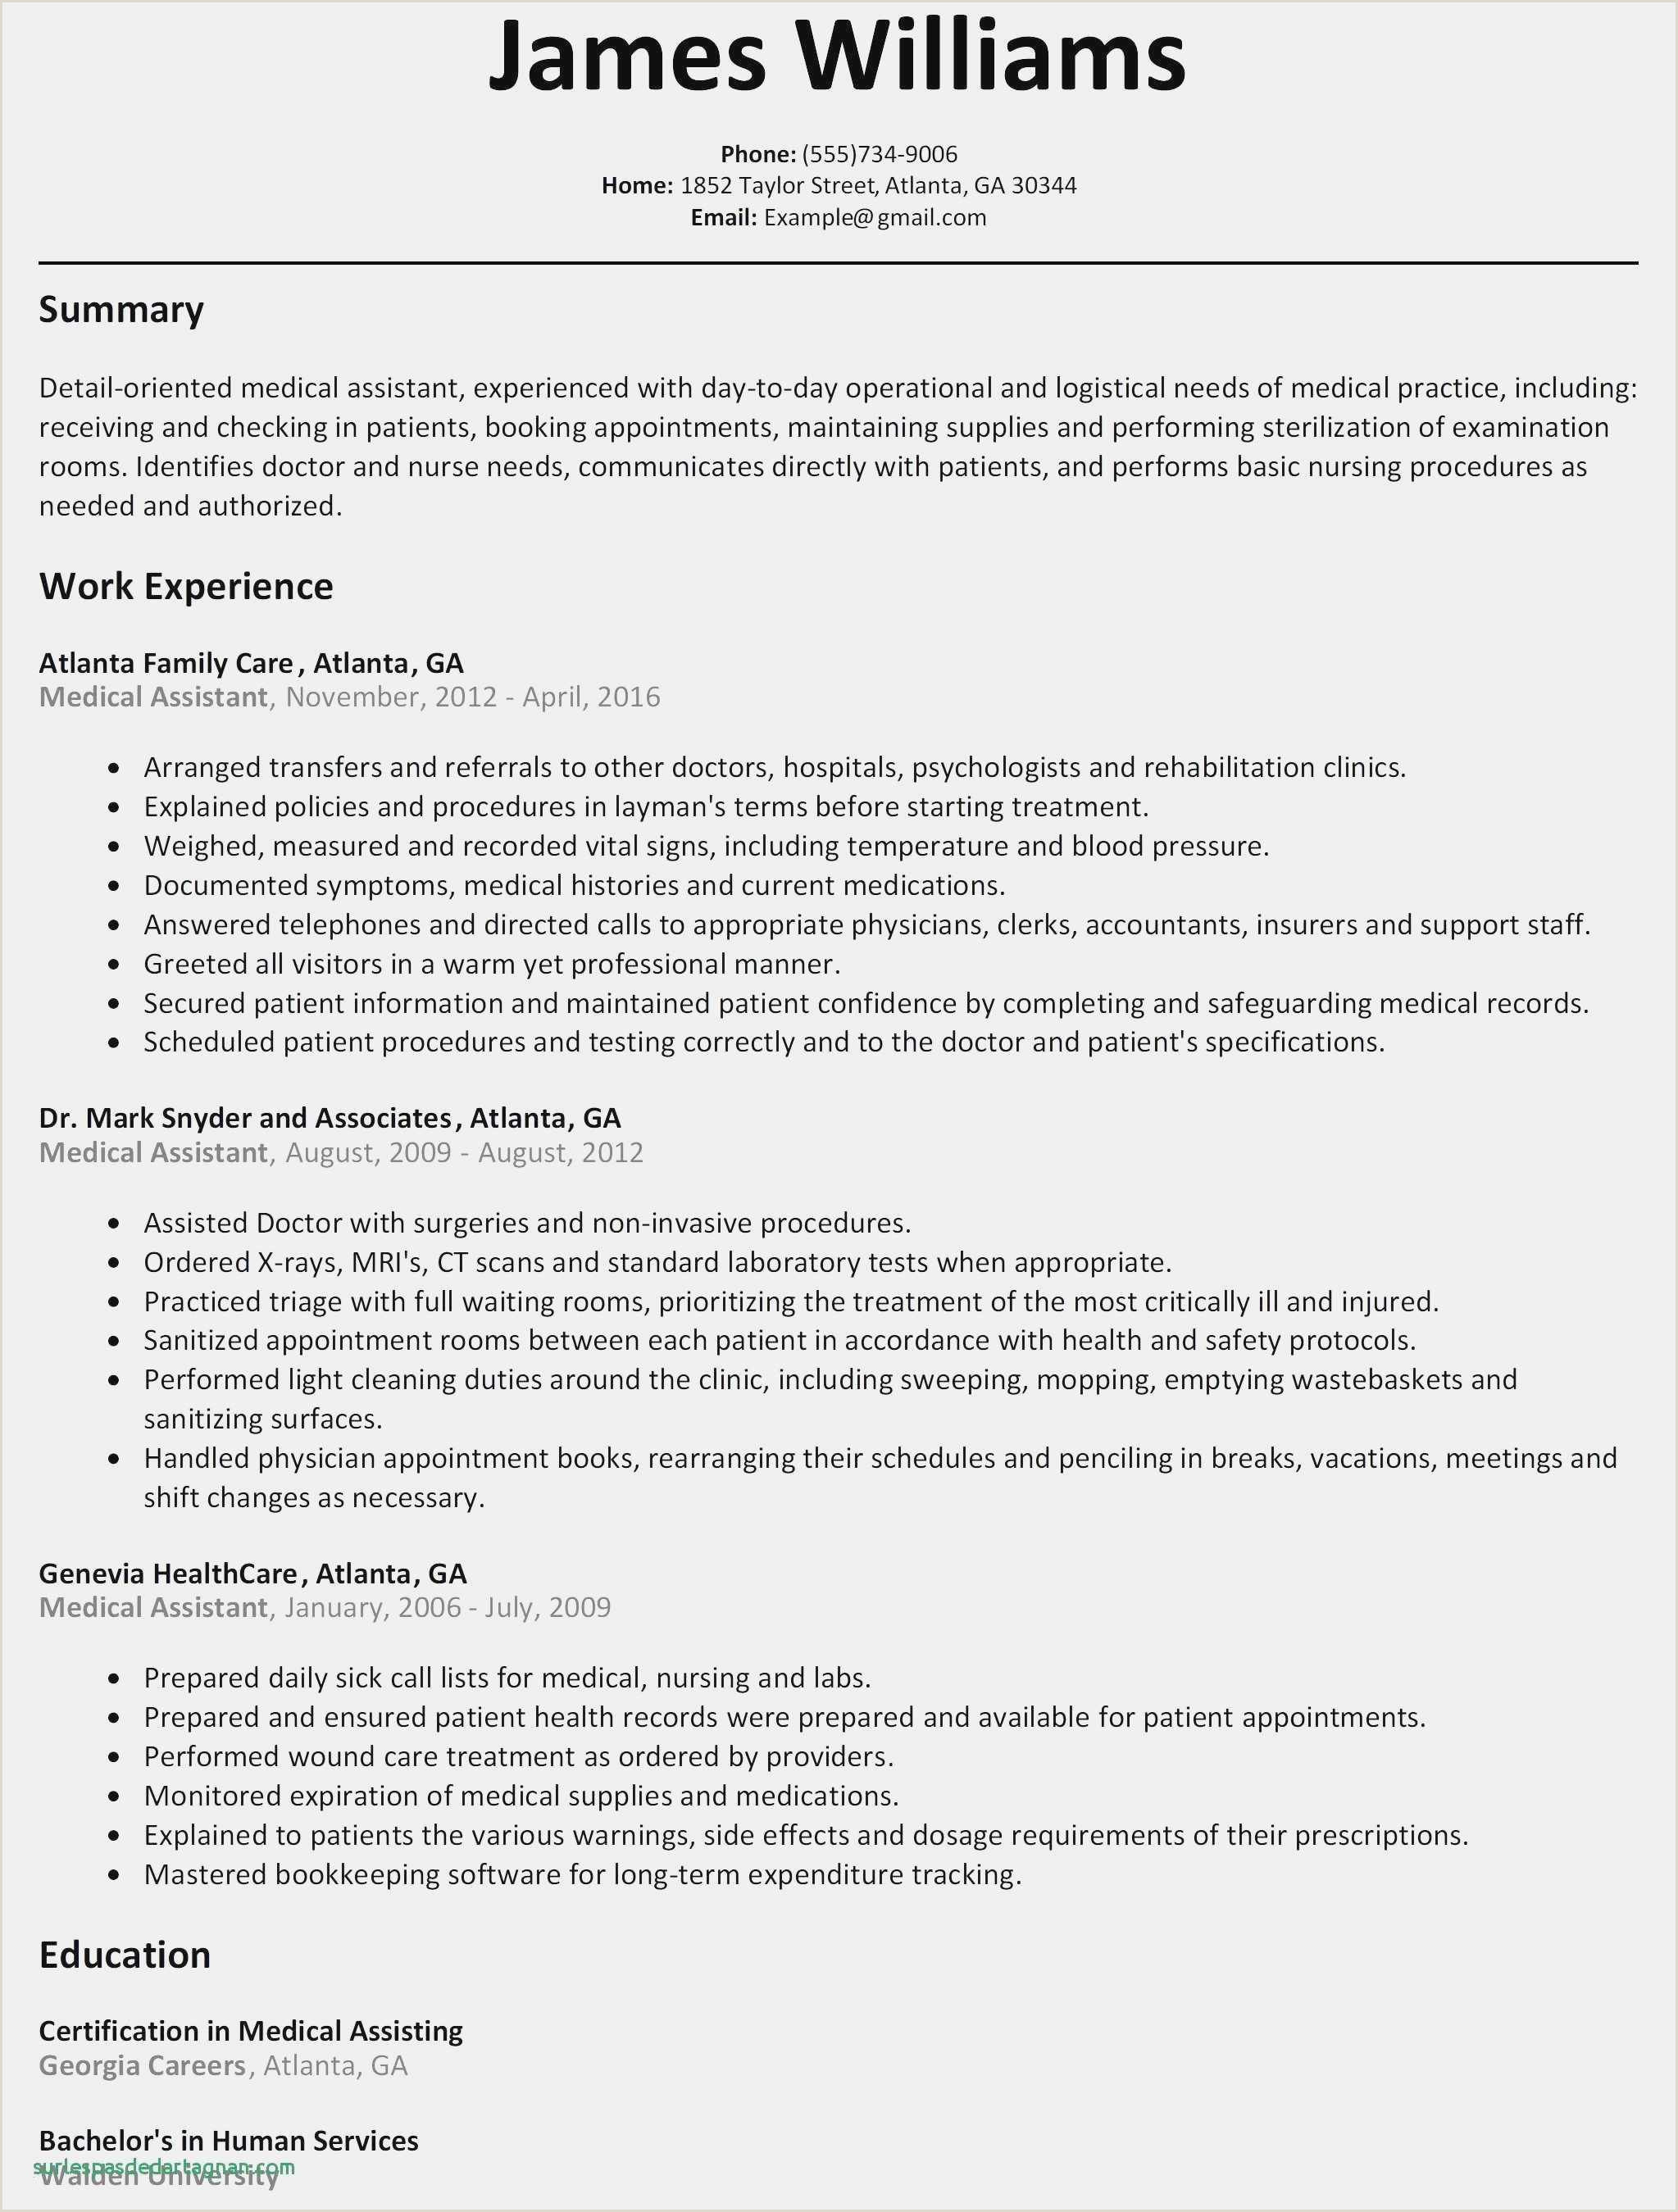 Free Download 60 Free Professional Resume Templates Free